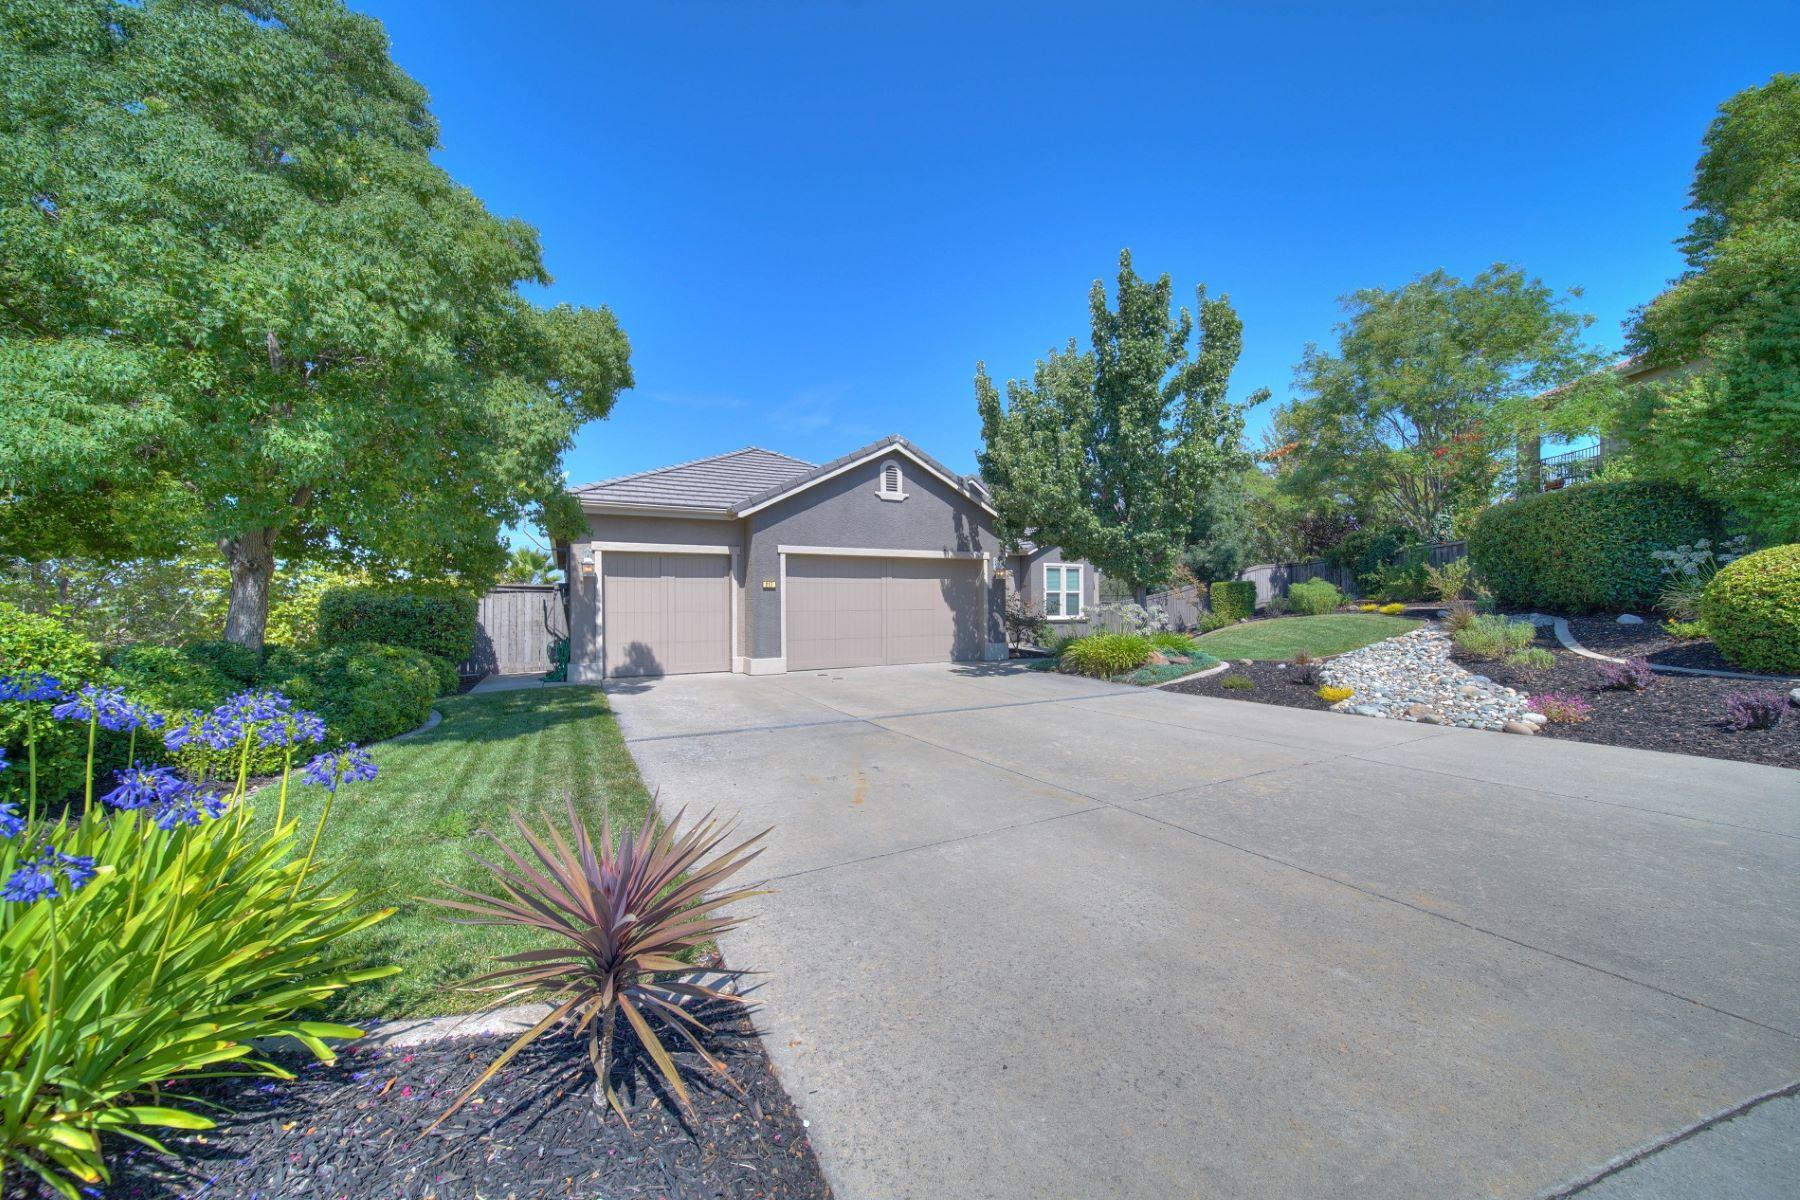 Single Family Home for Sale at 217 Vista Ridge Ct, Roseville, CA 95661 Roseville, California 95661 United States